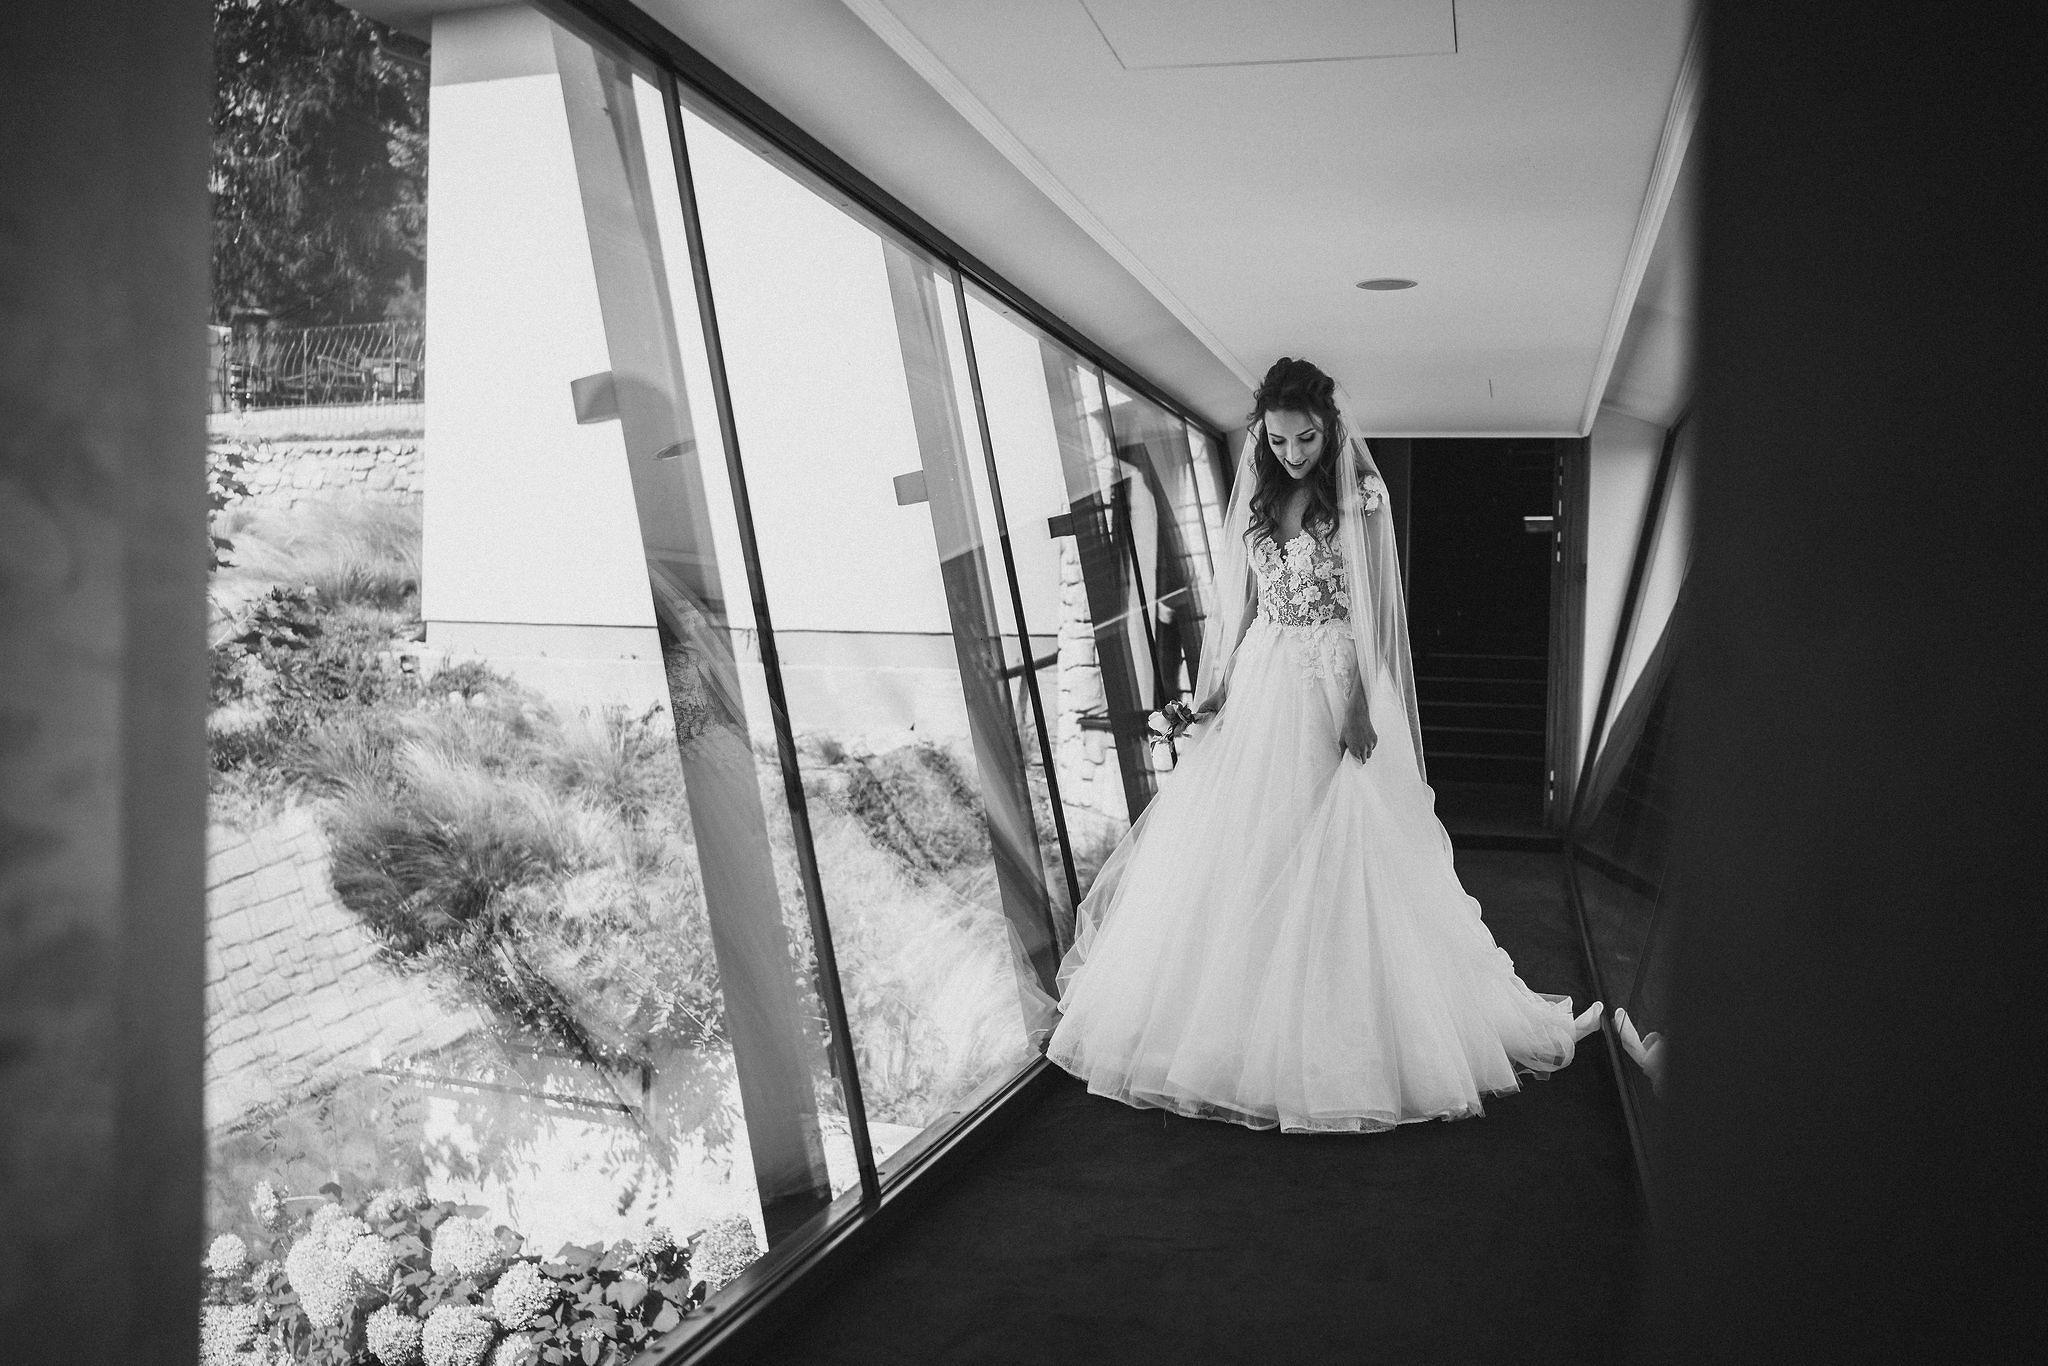 saty-wedding-avenue-cenajpg